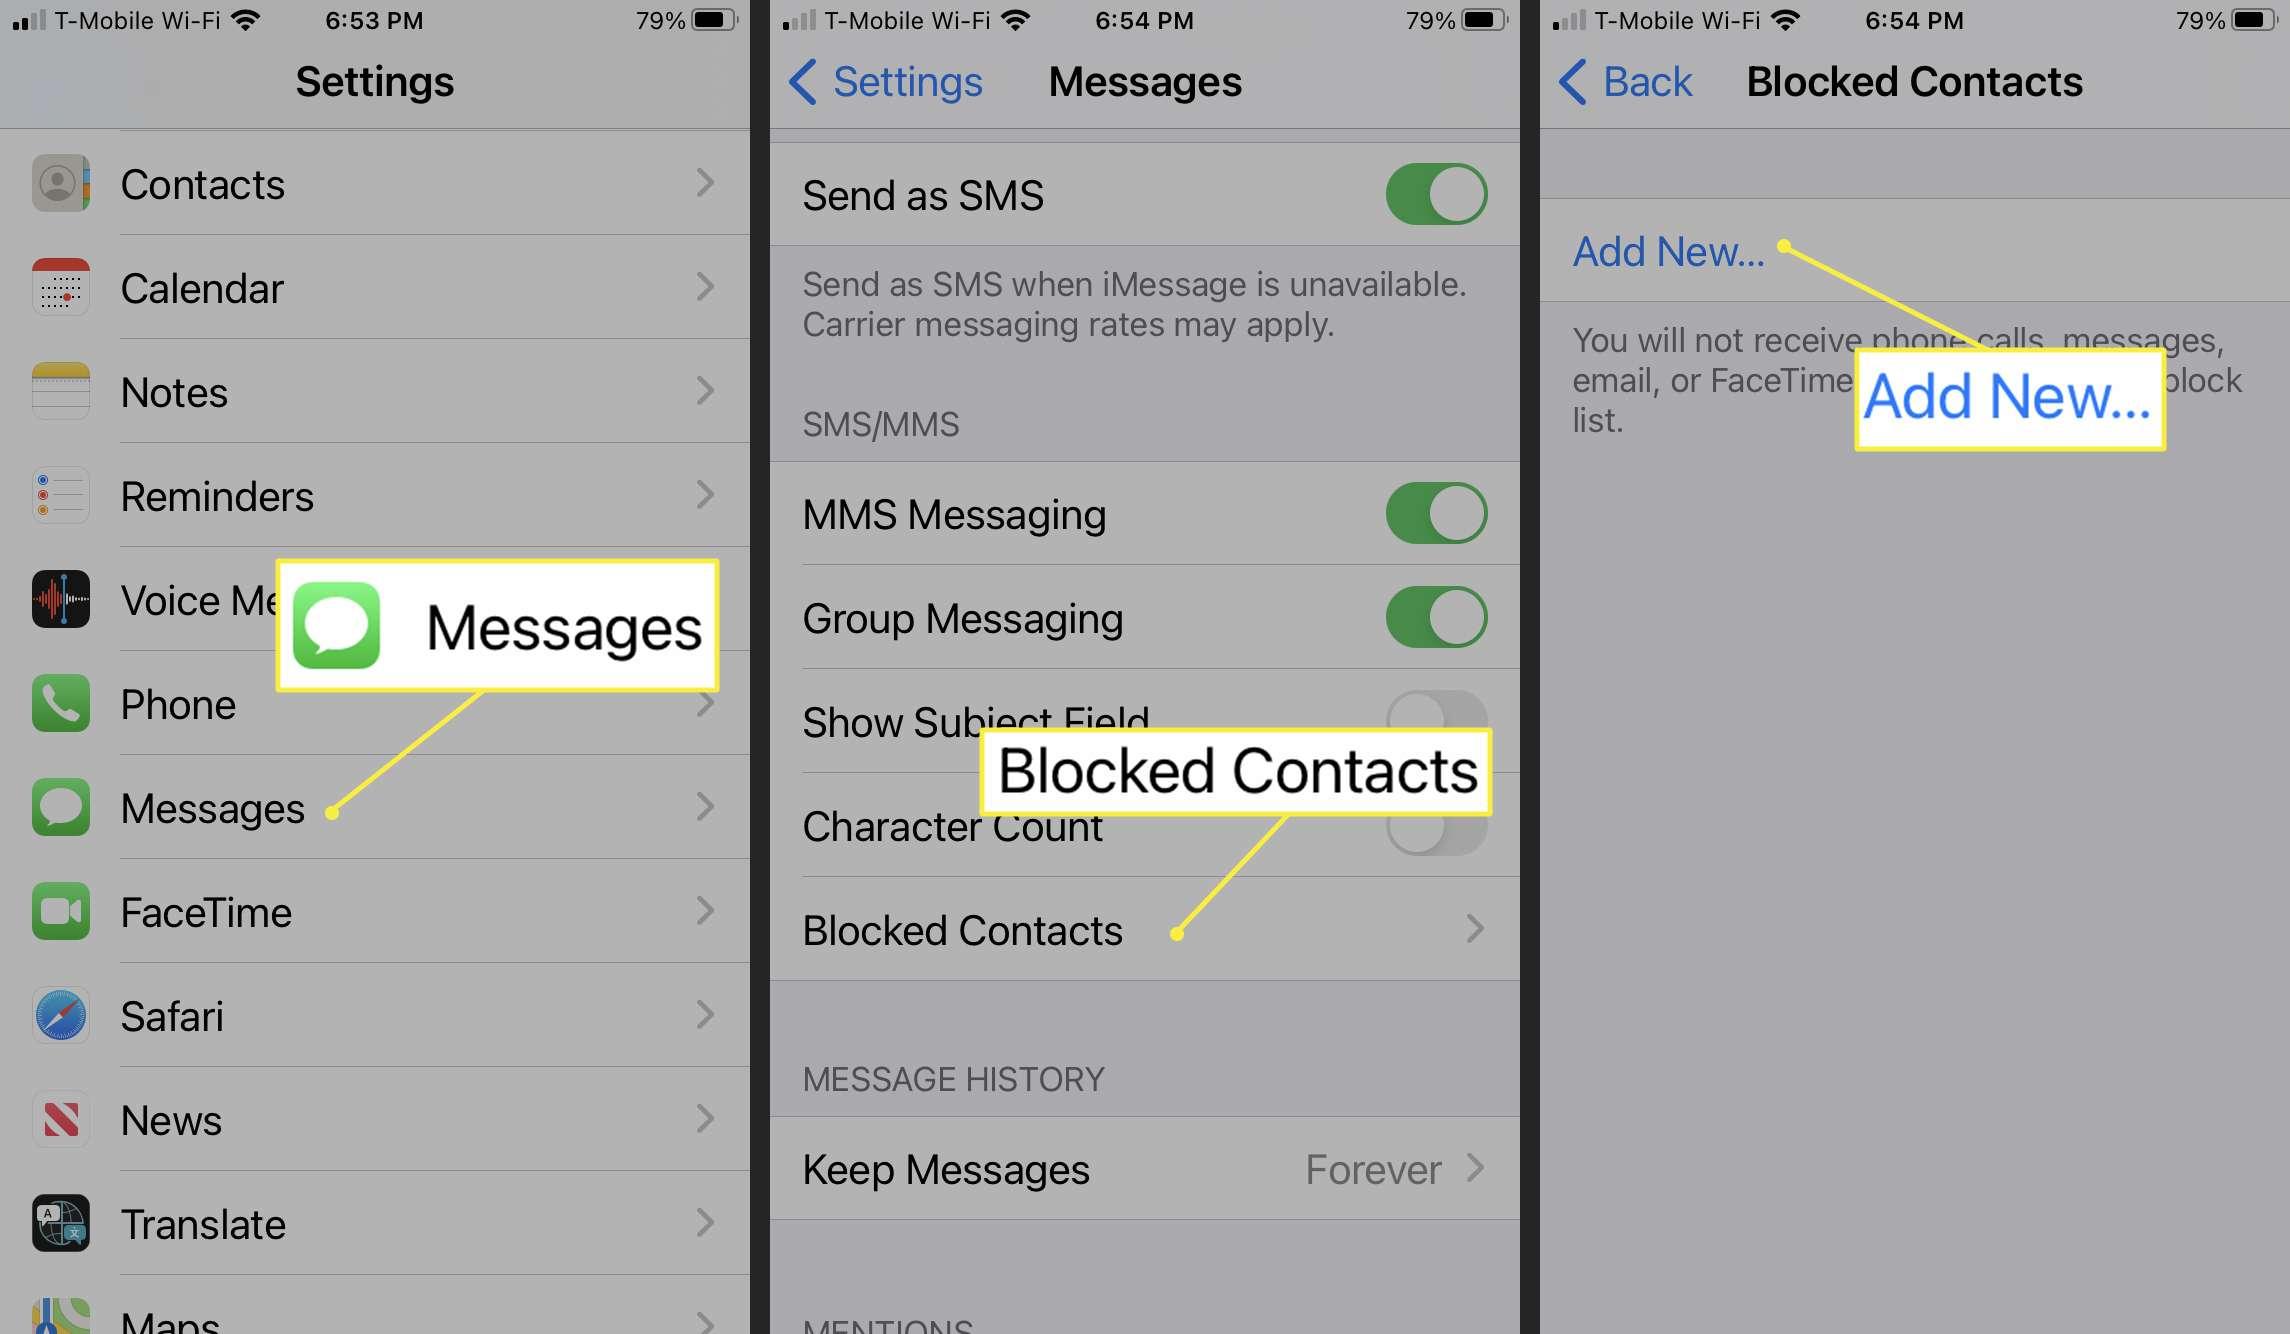 Adding new blocked contact